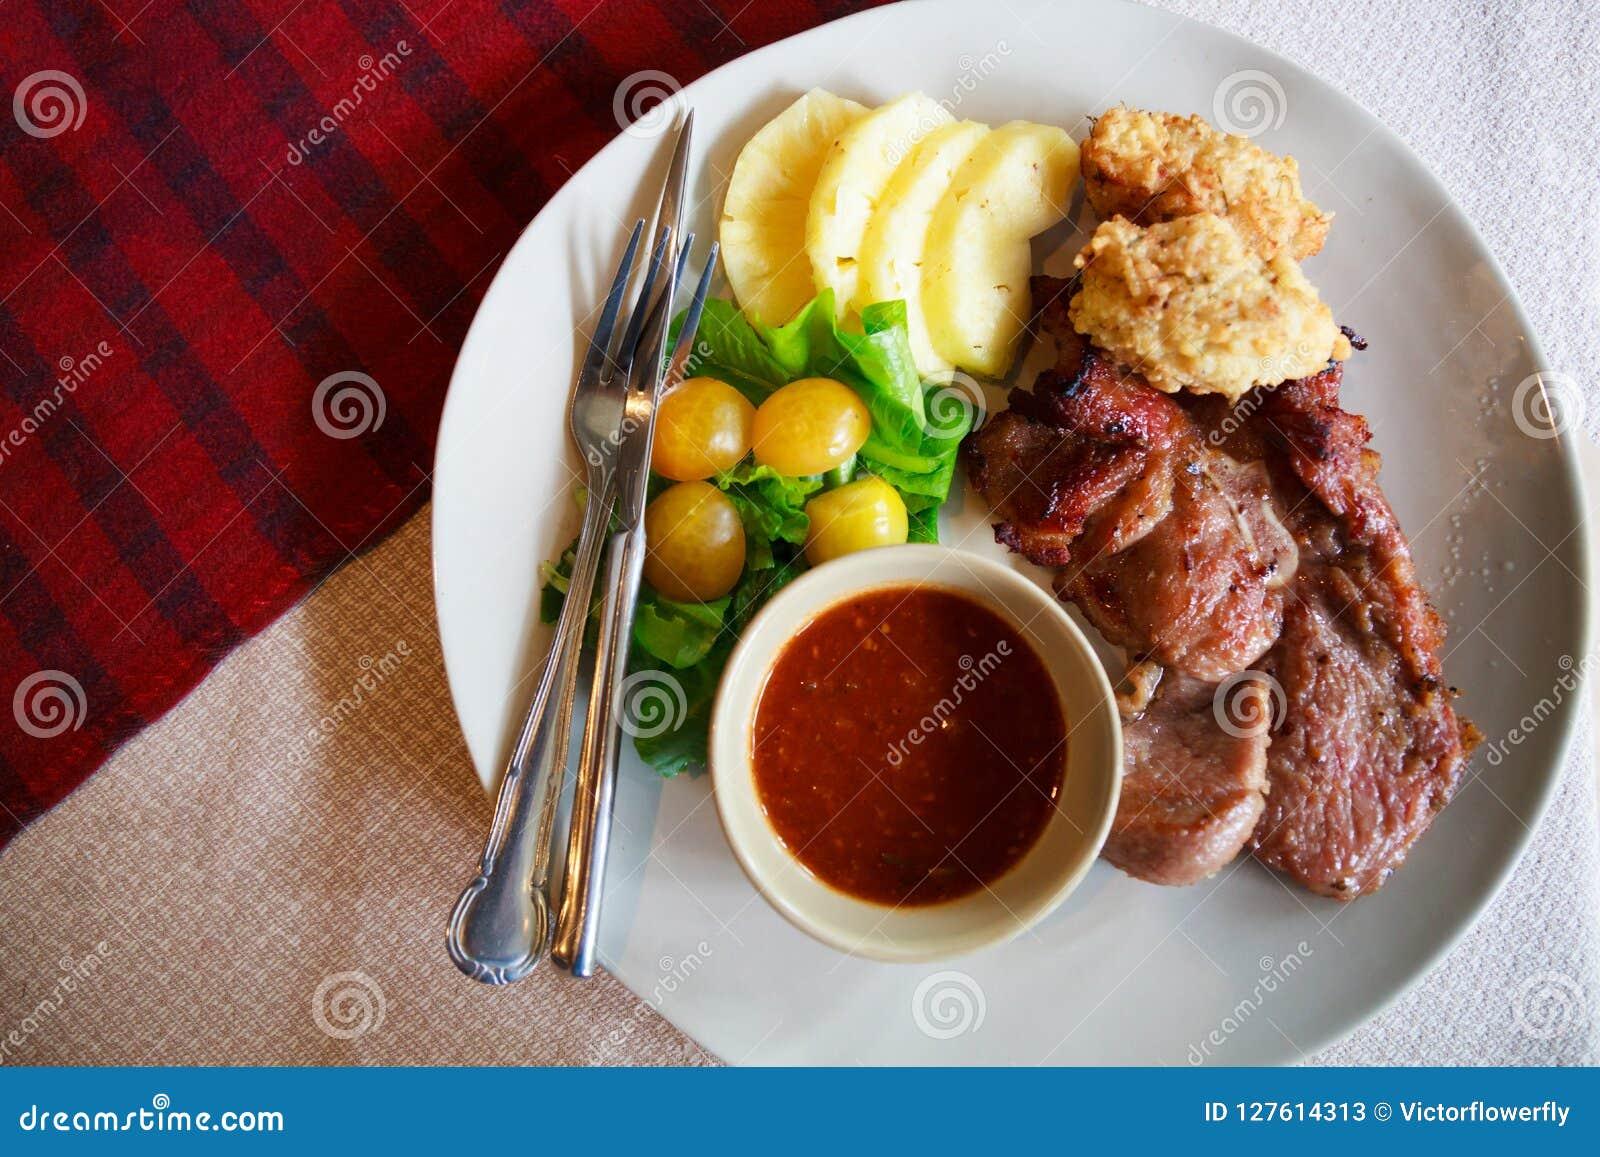 De Thaise Keuken, Varkensvleeslapje vlees met diep In brand gestoken Kleverige Rijst dompelde met traditionele kruidige rode Spaa